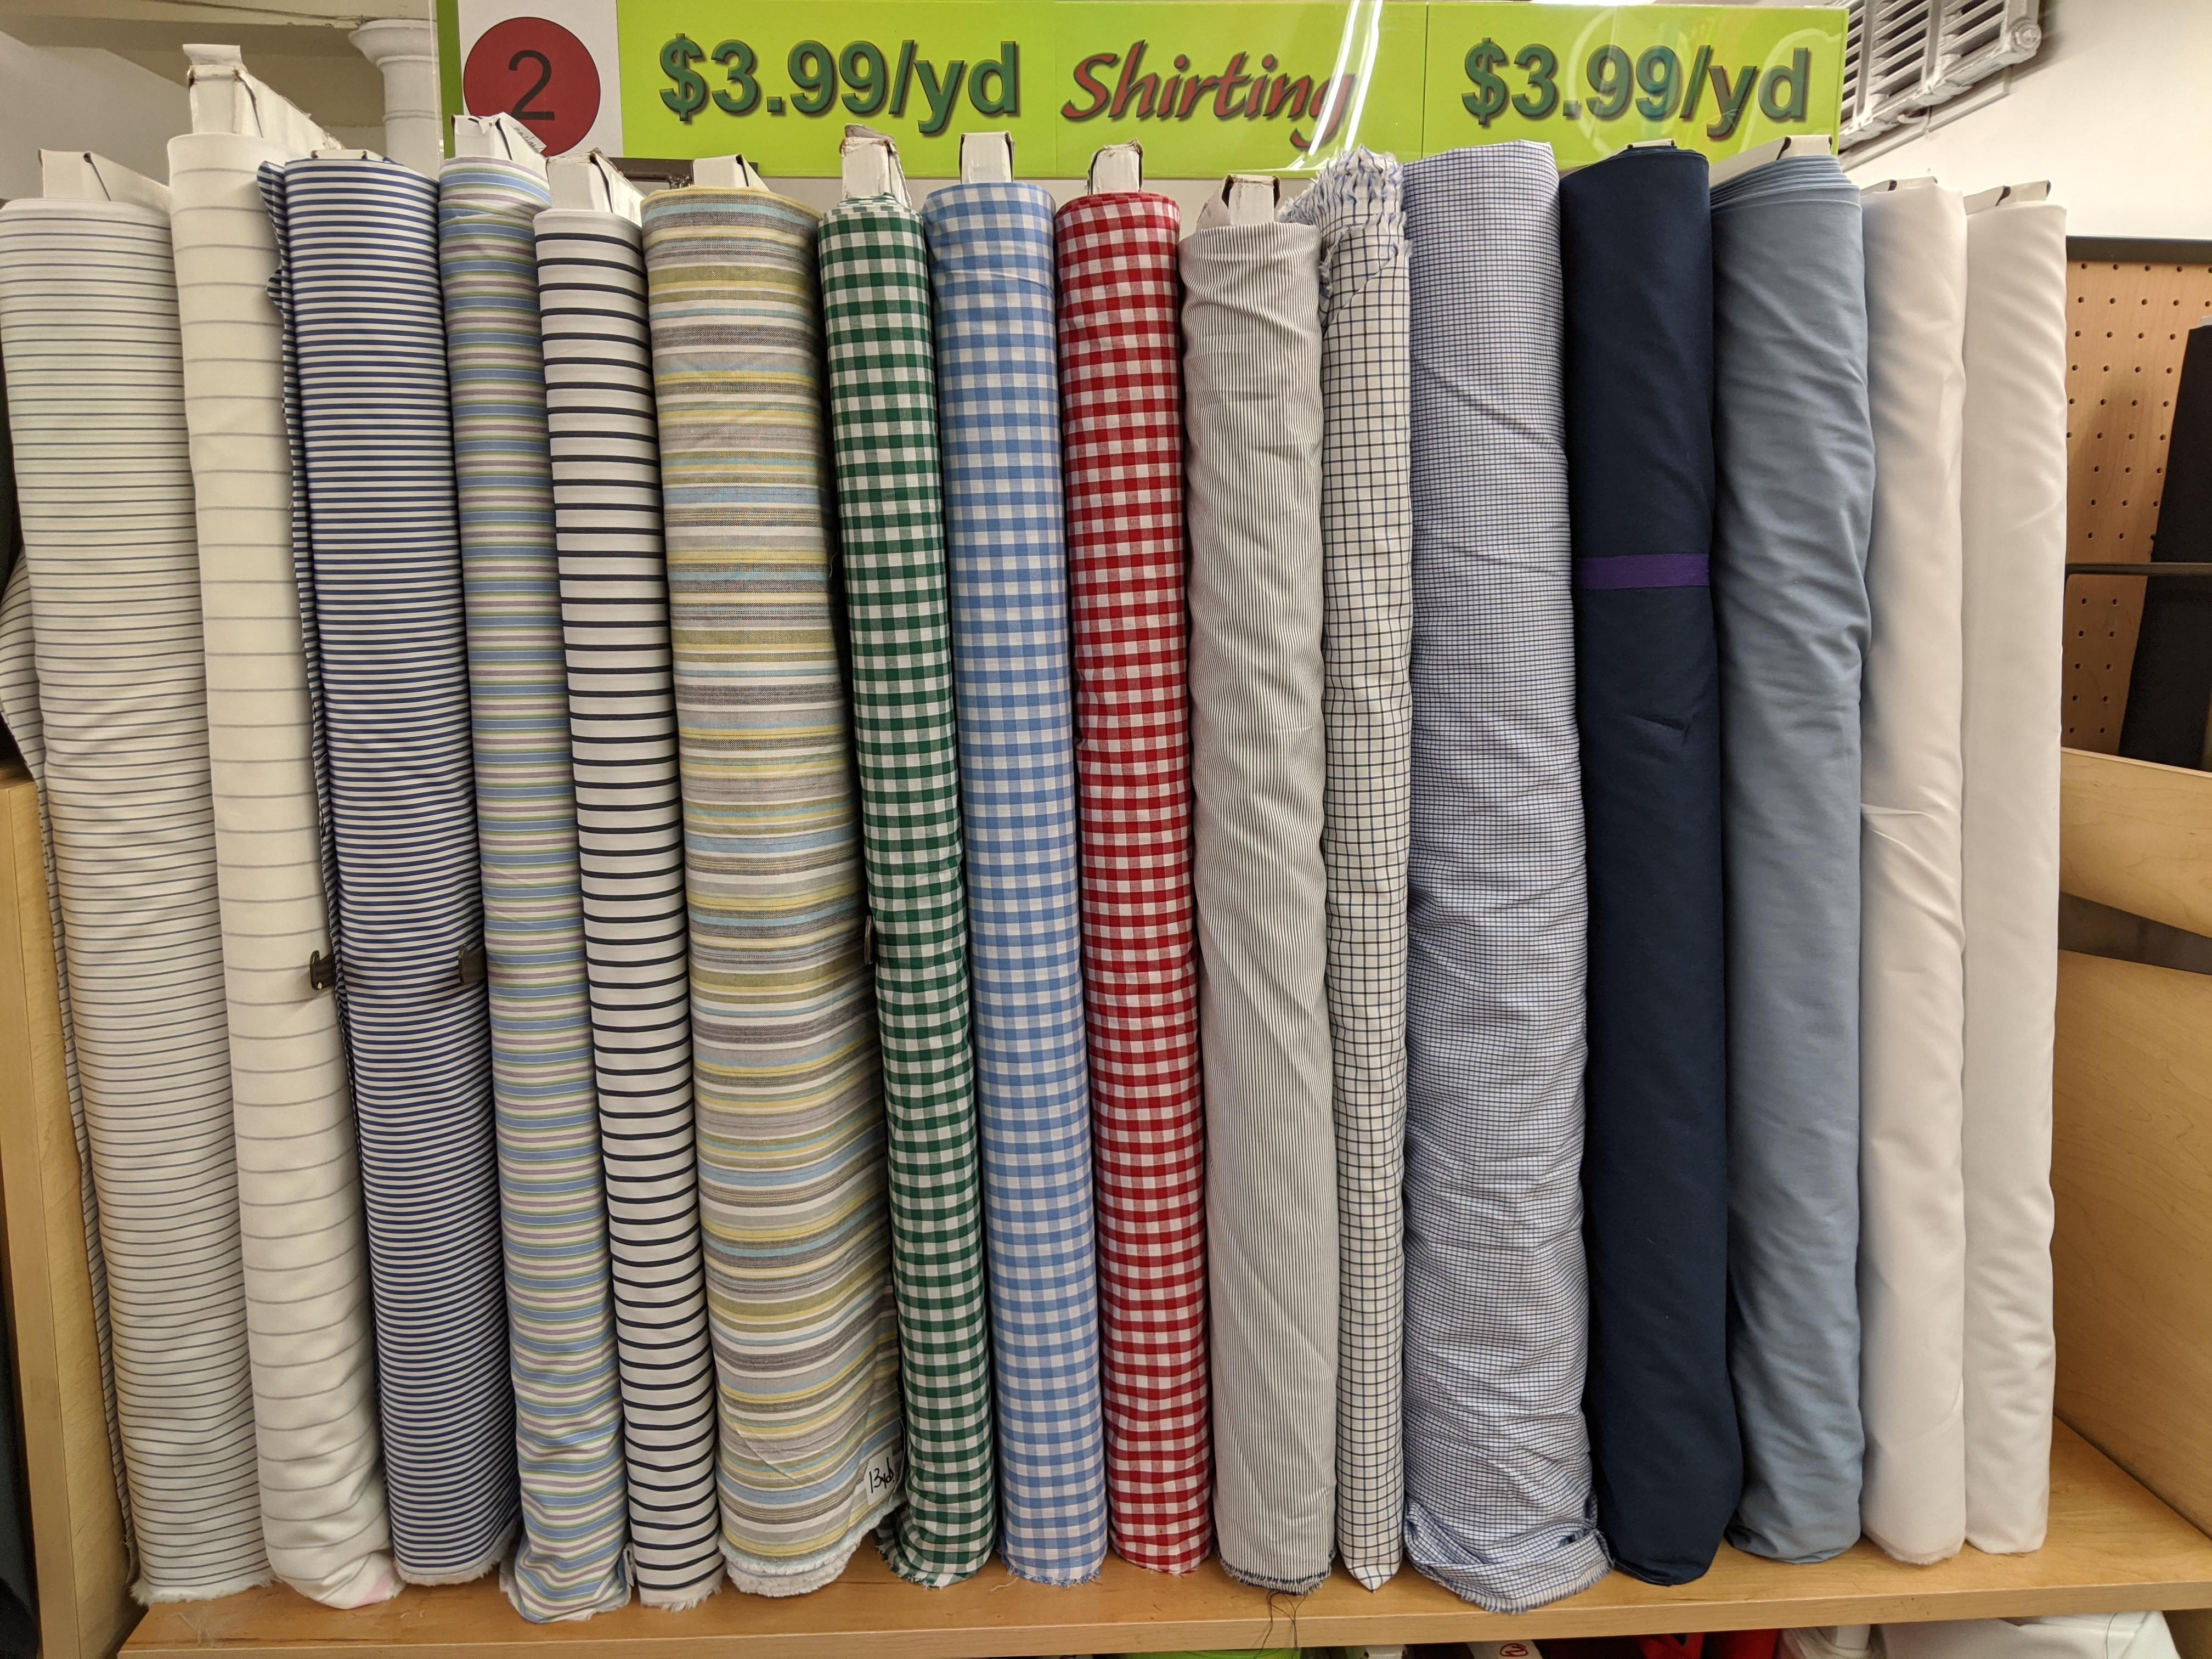 Cotton Shirting Assortment